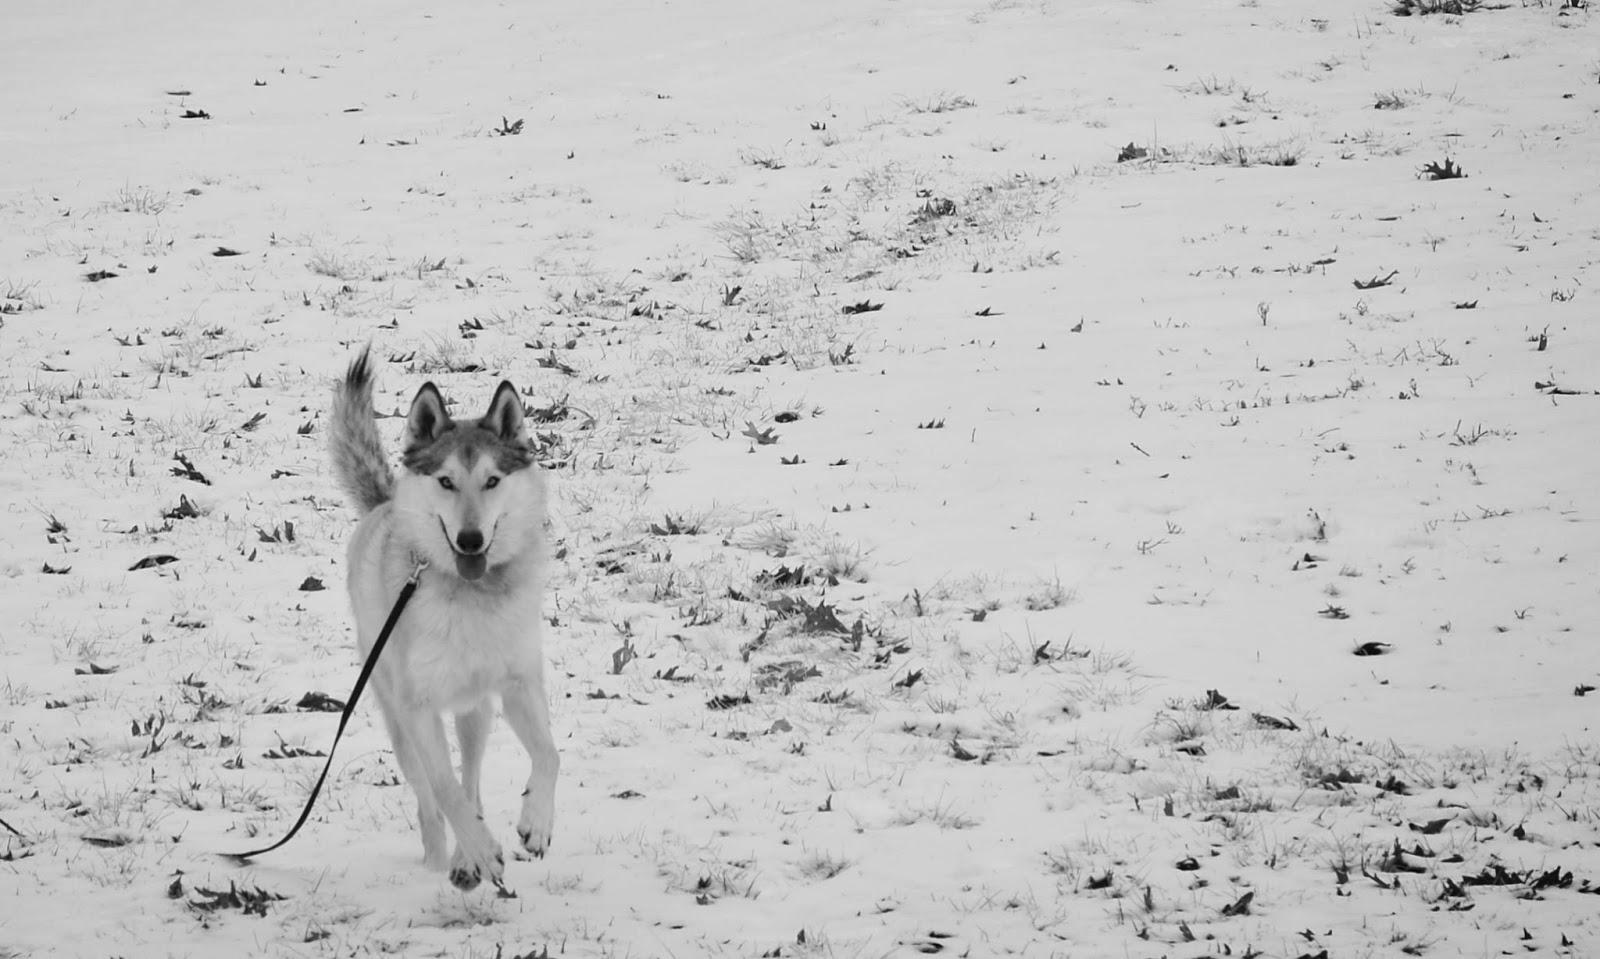 mid content wolfdog